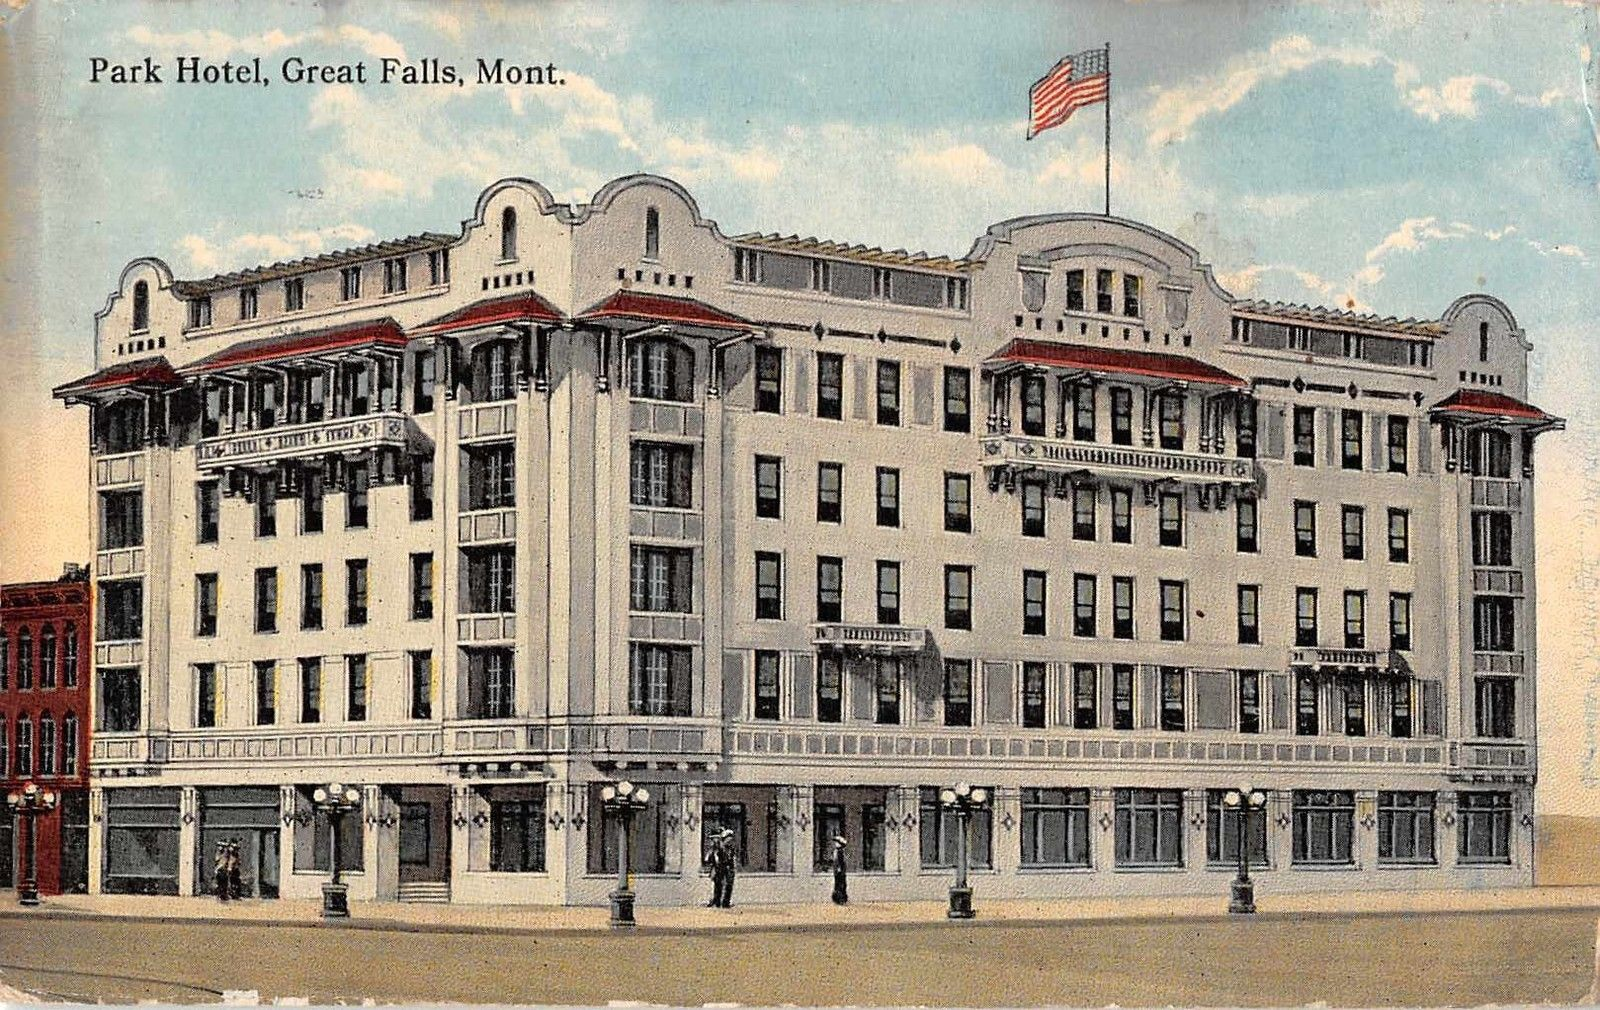 Great Falls Montana Park Hotel Antique Postcard J33476 Mary L Martin Ltd Postcards